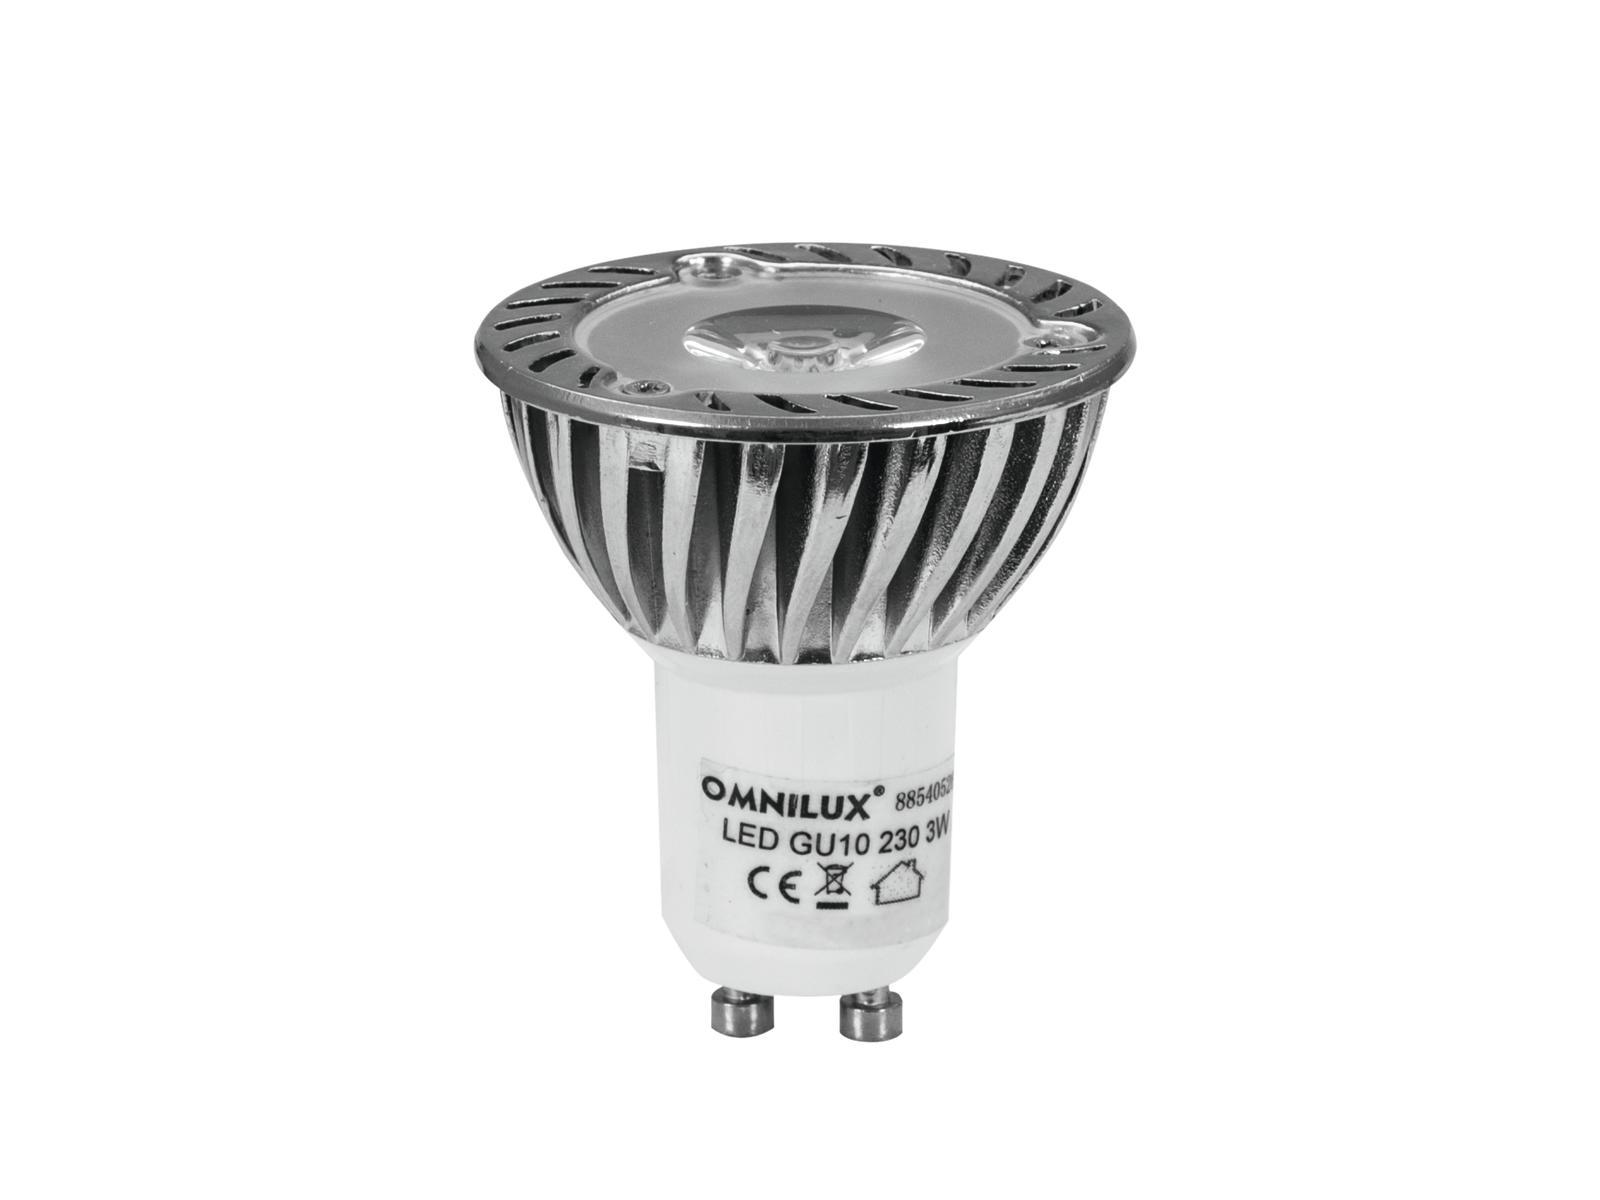 230V GU-10 3W LED Omnilux, žlutá